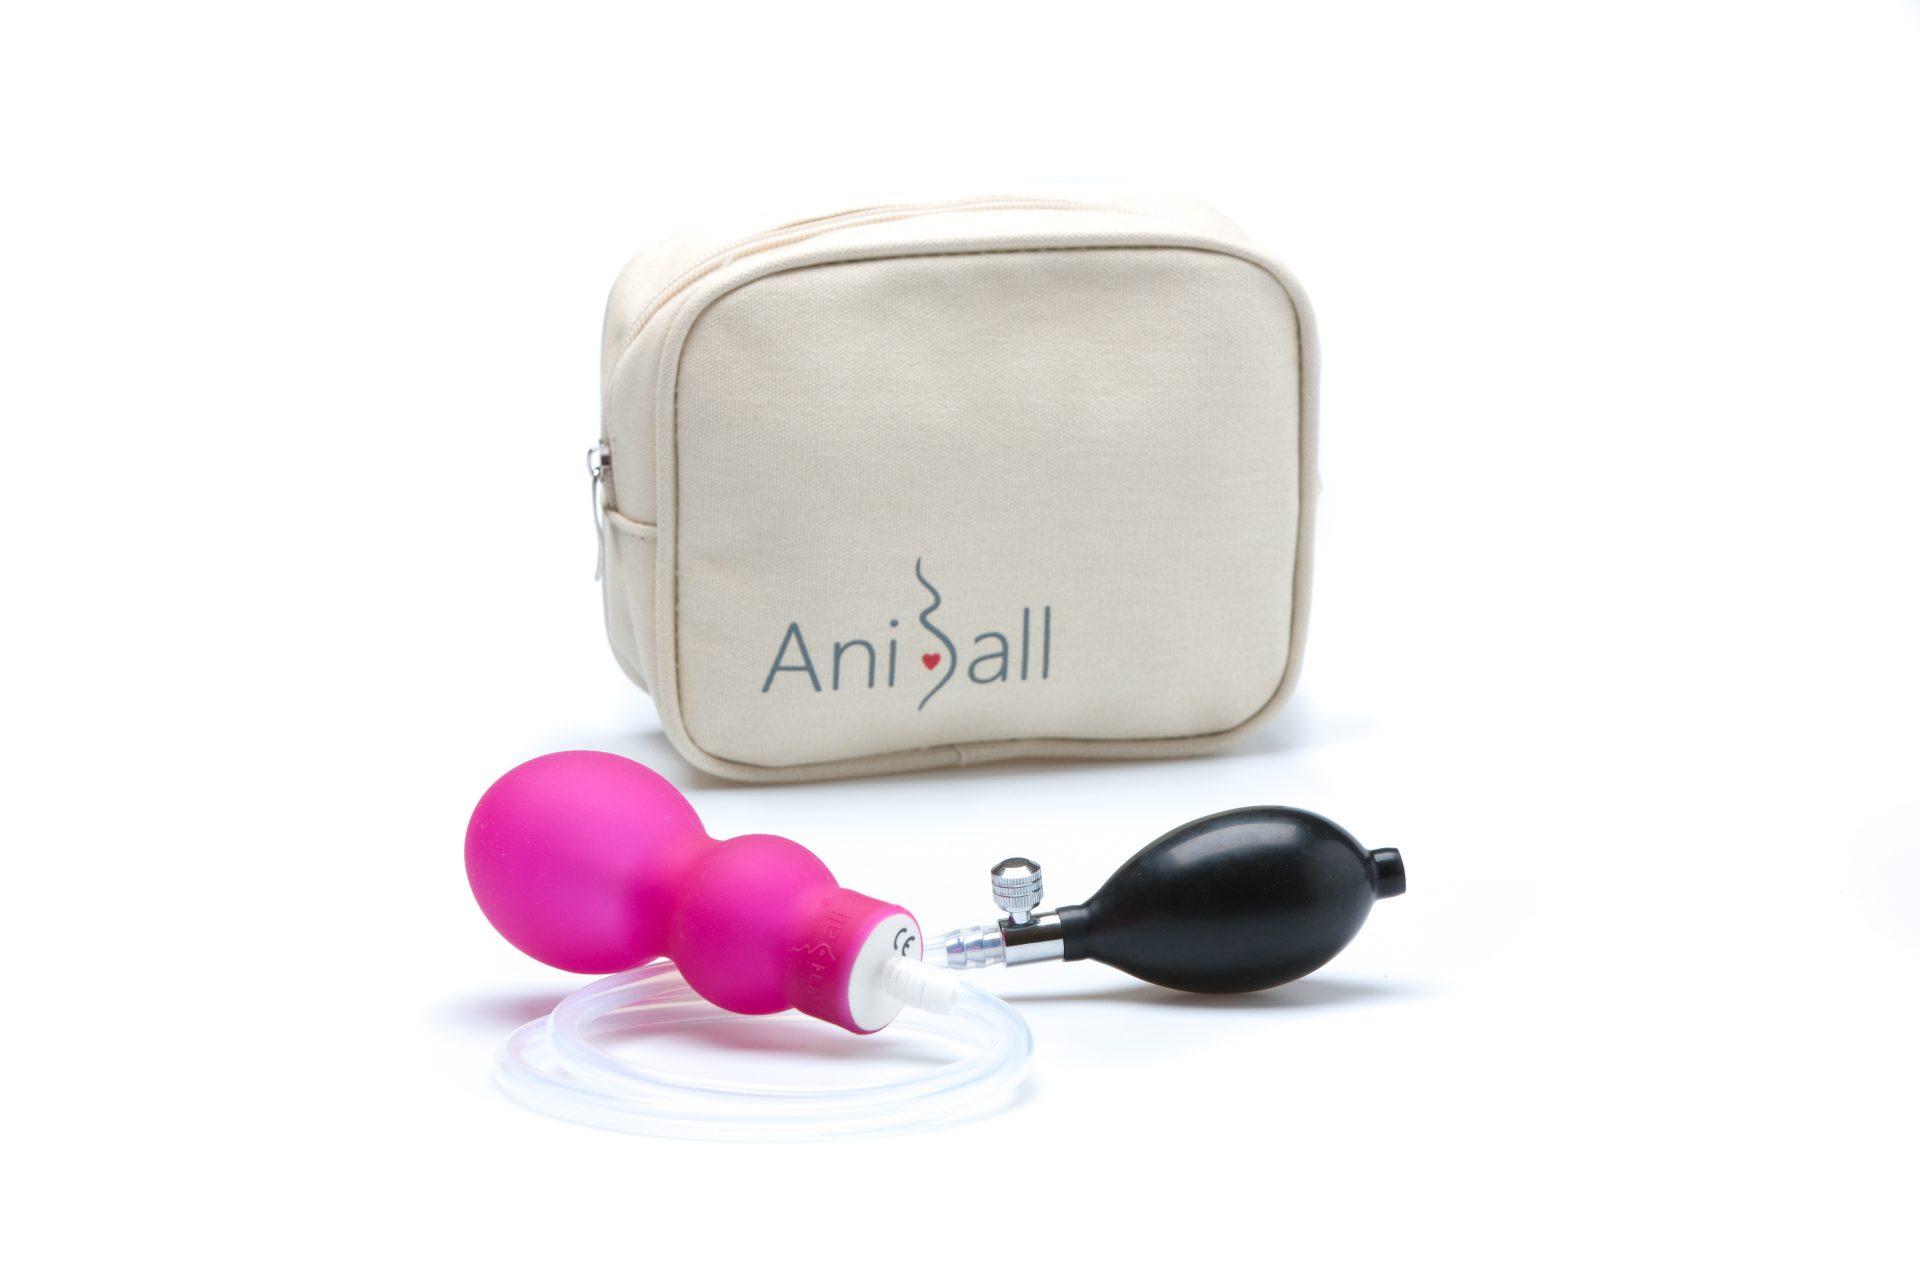 bb2784203658 Aniball